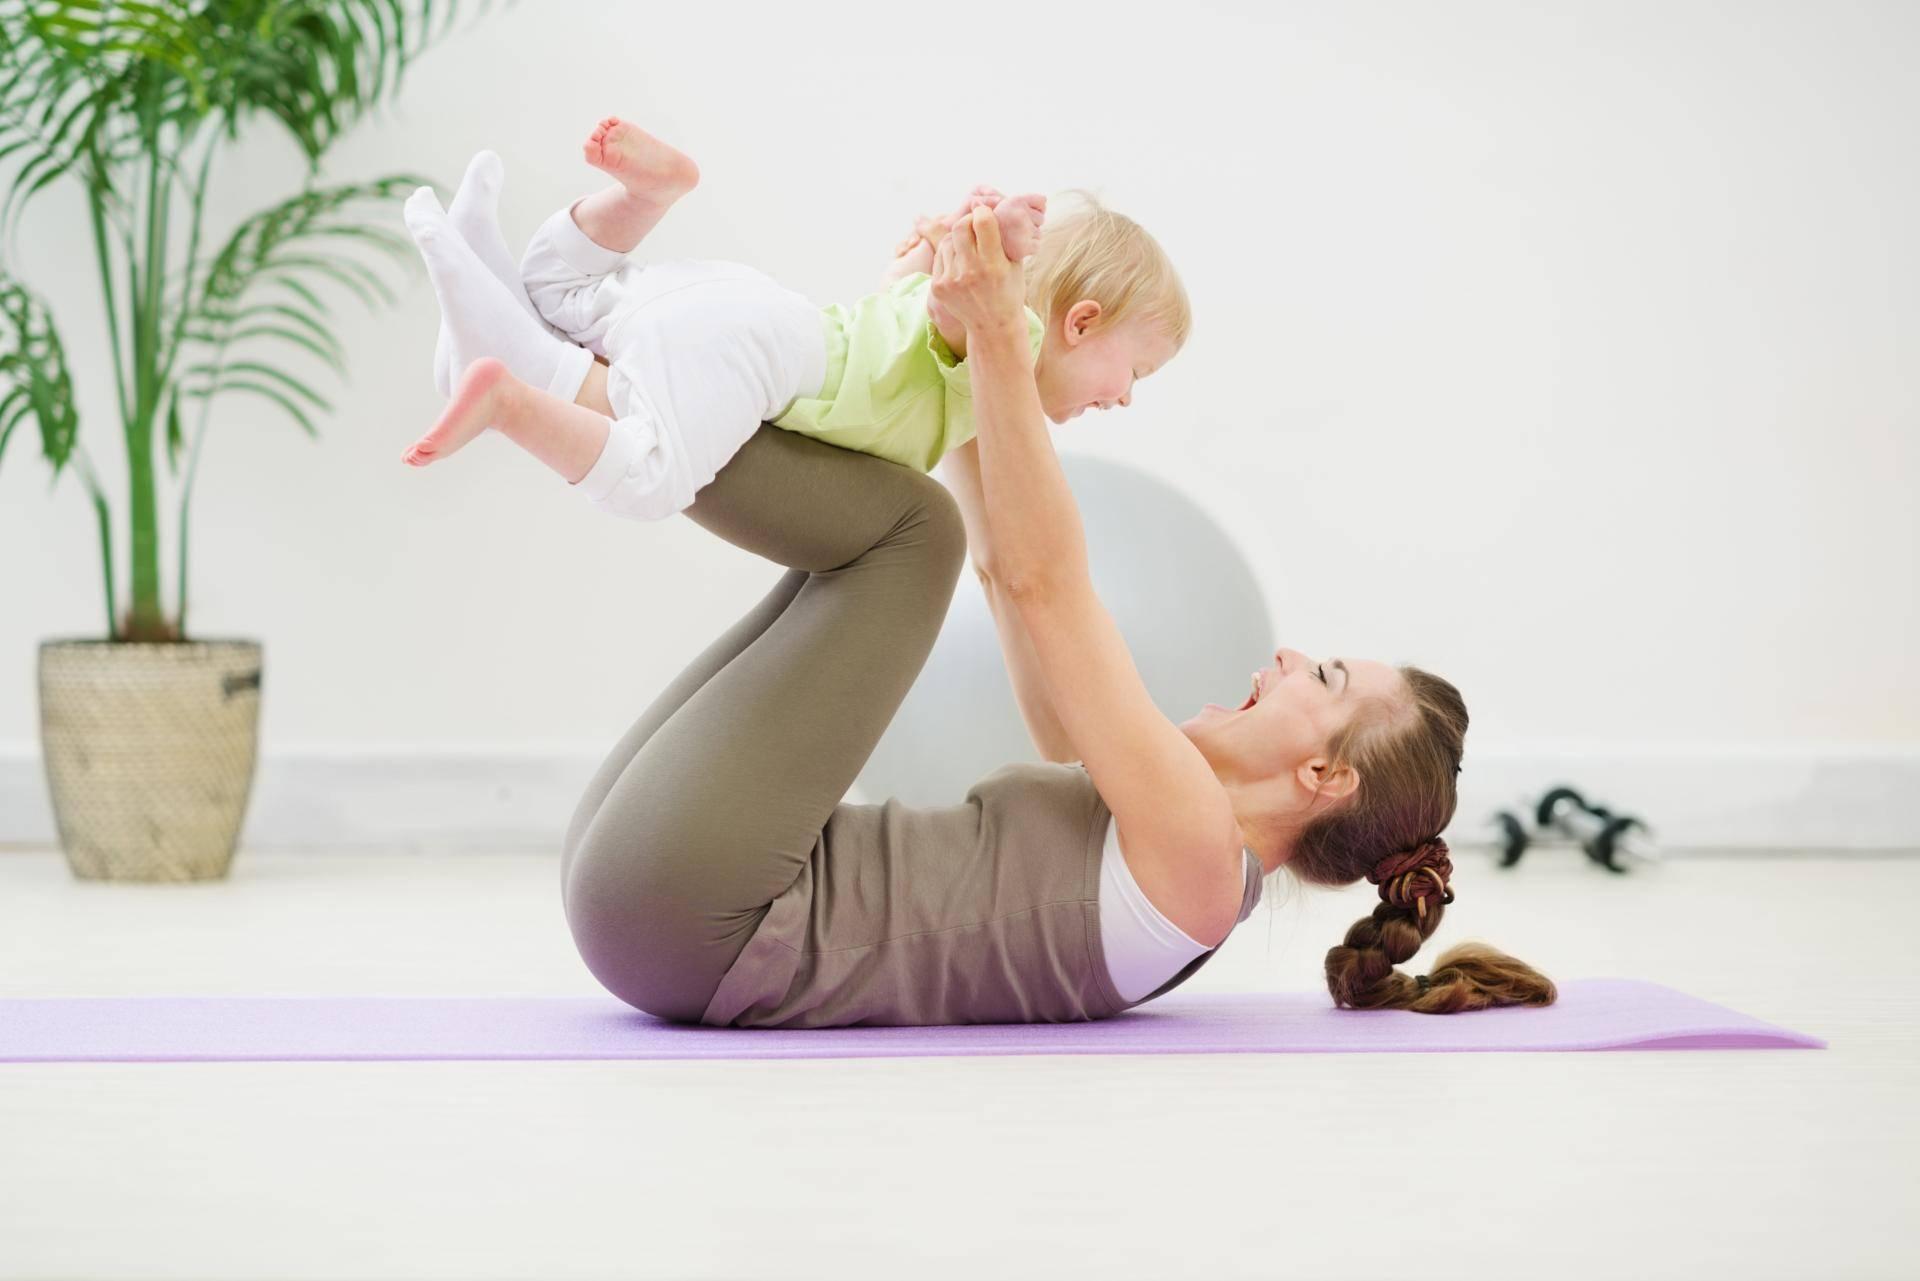 Бэйби йога: на заметку родителям грудничков